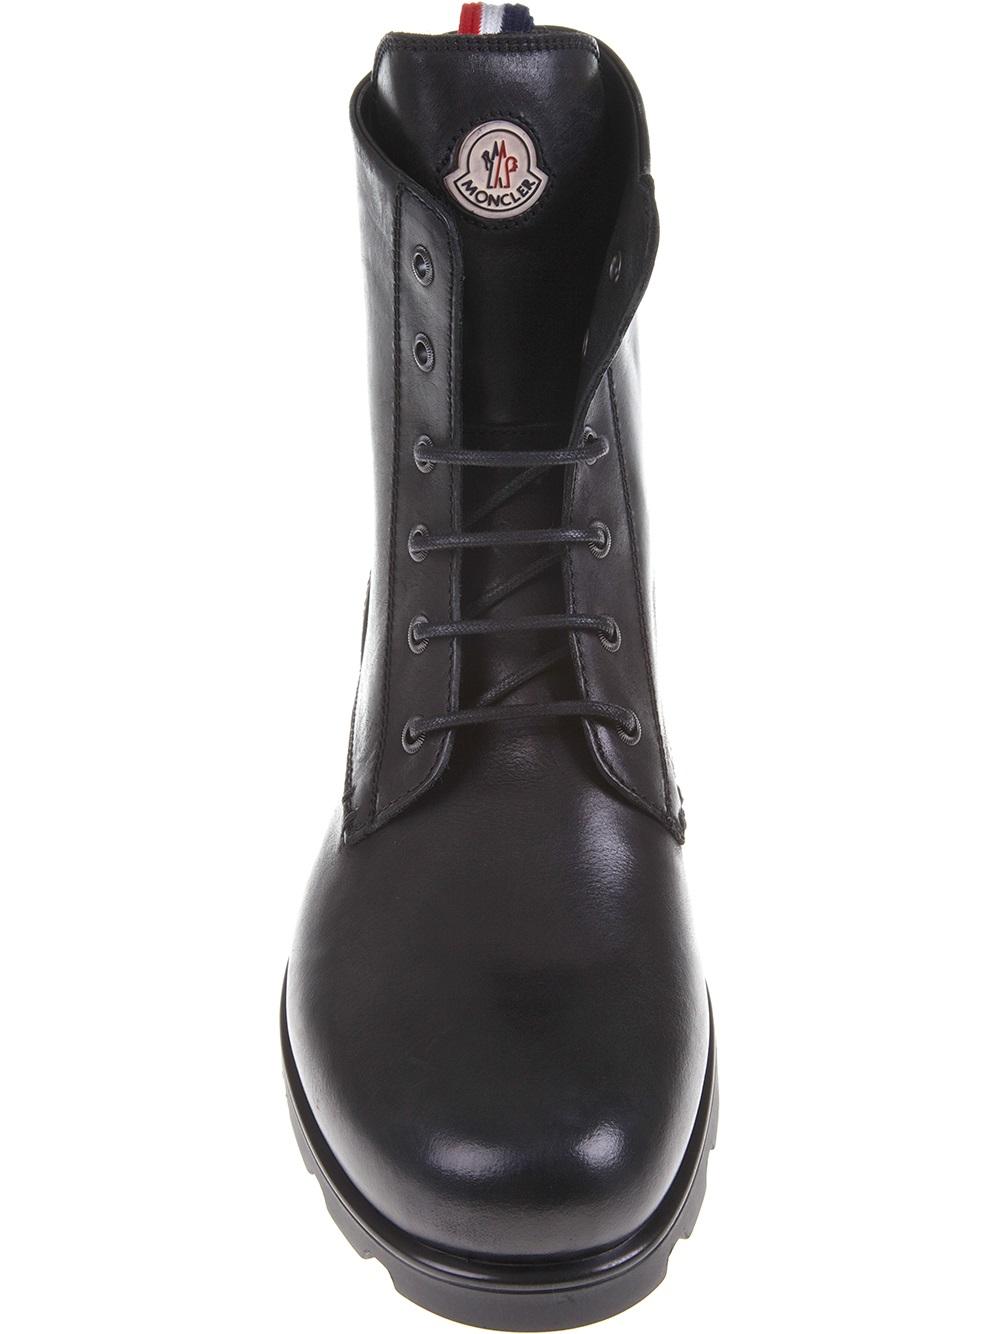 Moncler Vancouver Boot In Black For Men Lyst